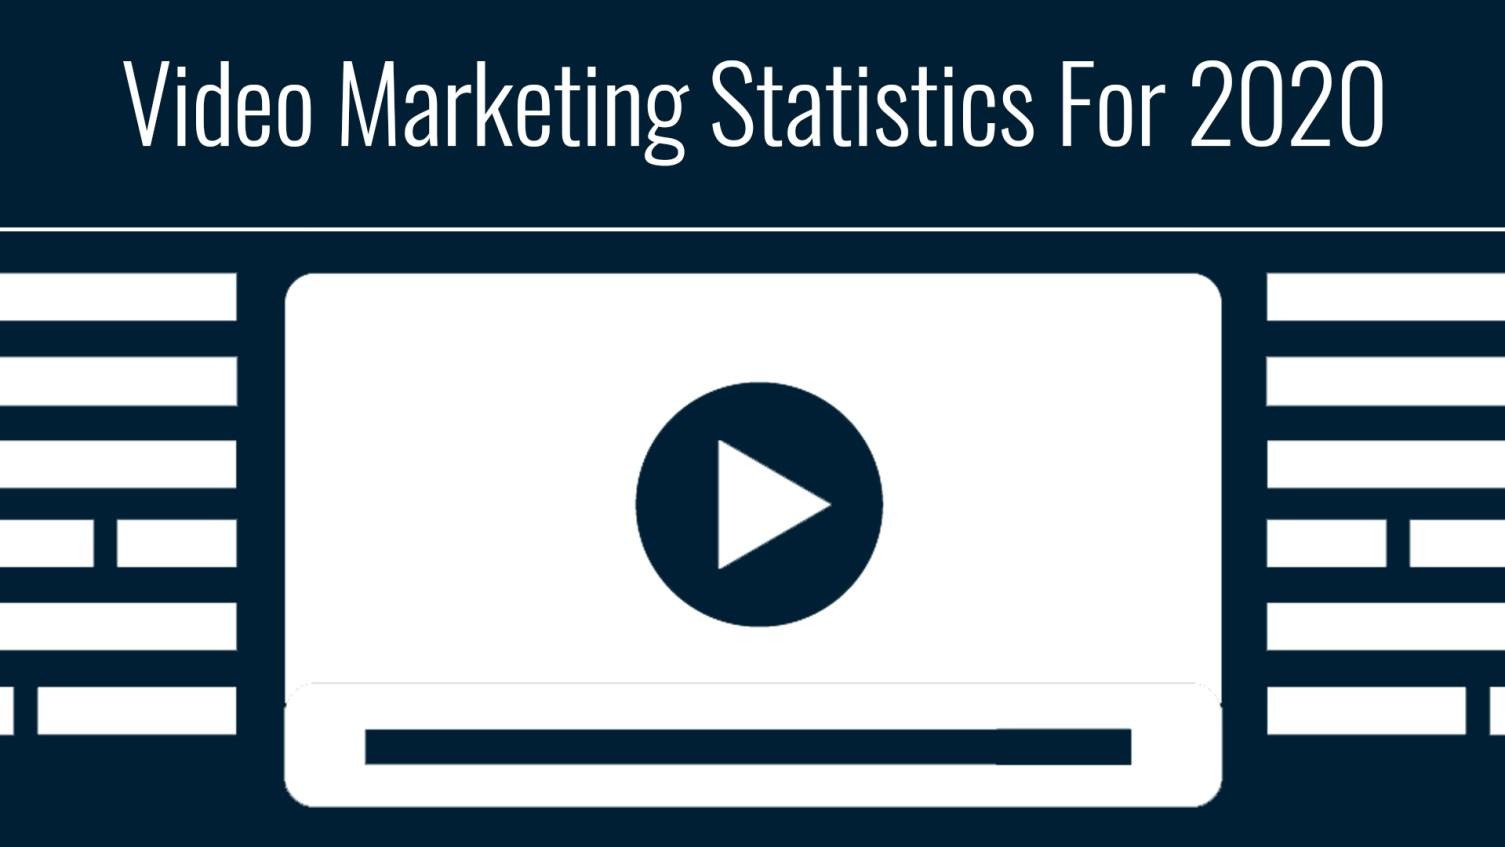 Video Marketing Statistics For 2020